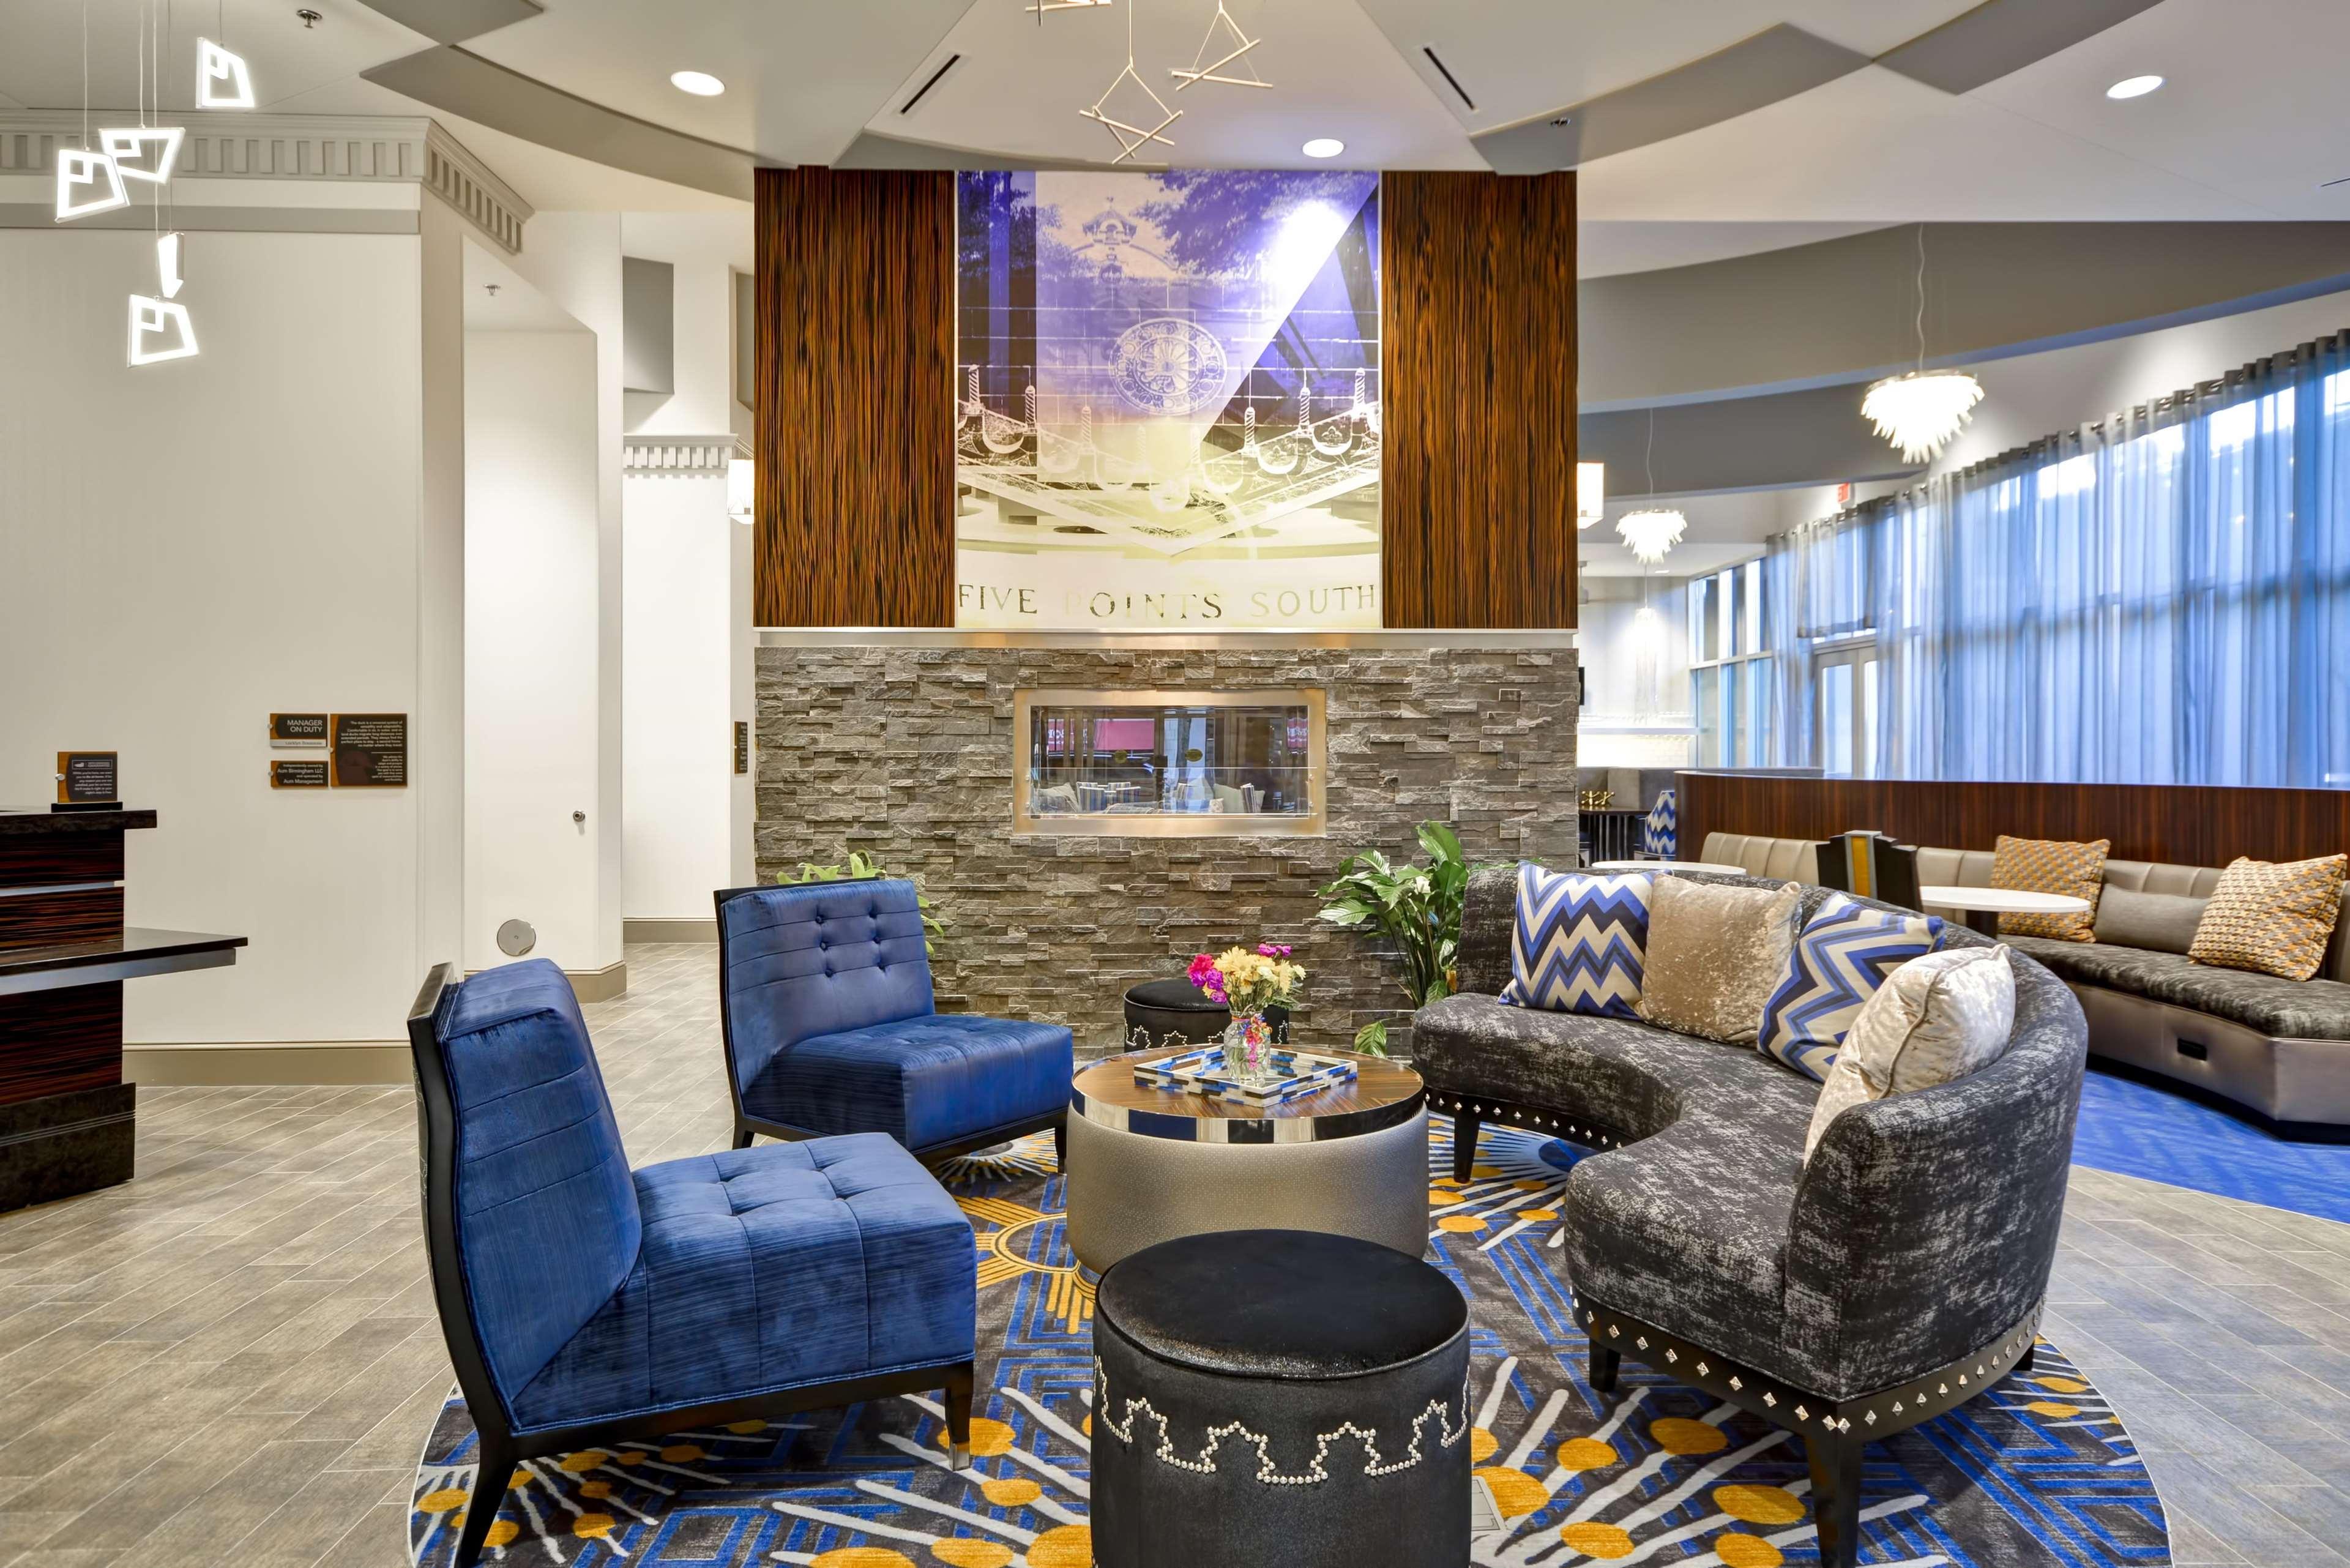 Homewood Suites by Hilton Birmingham Downtown Near UAB image 3